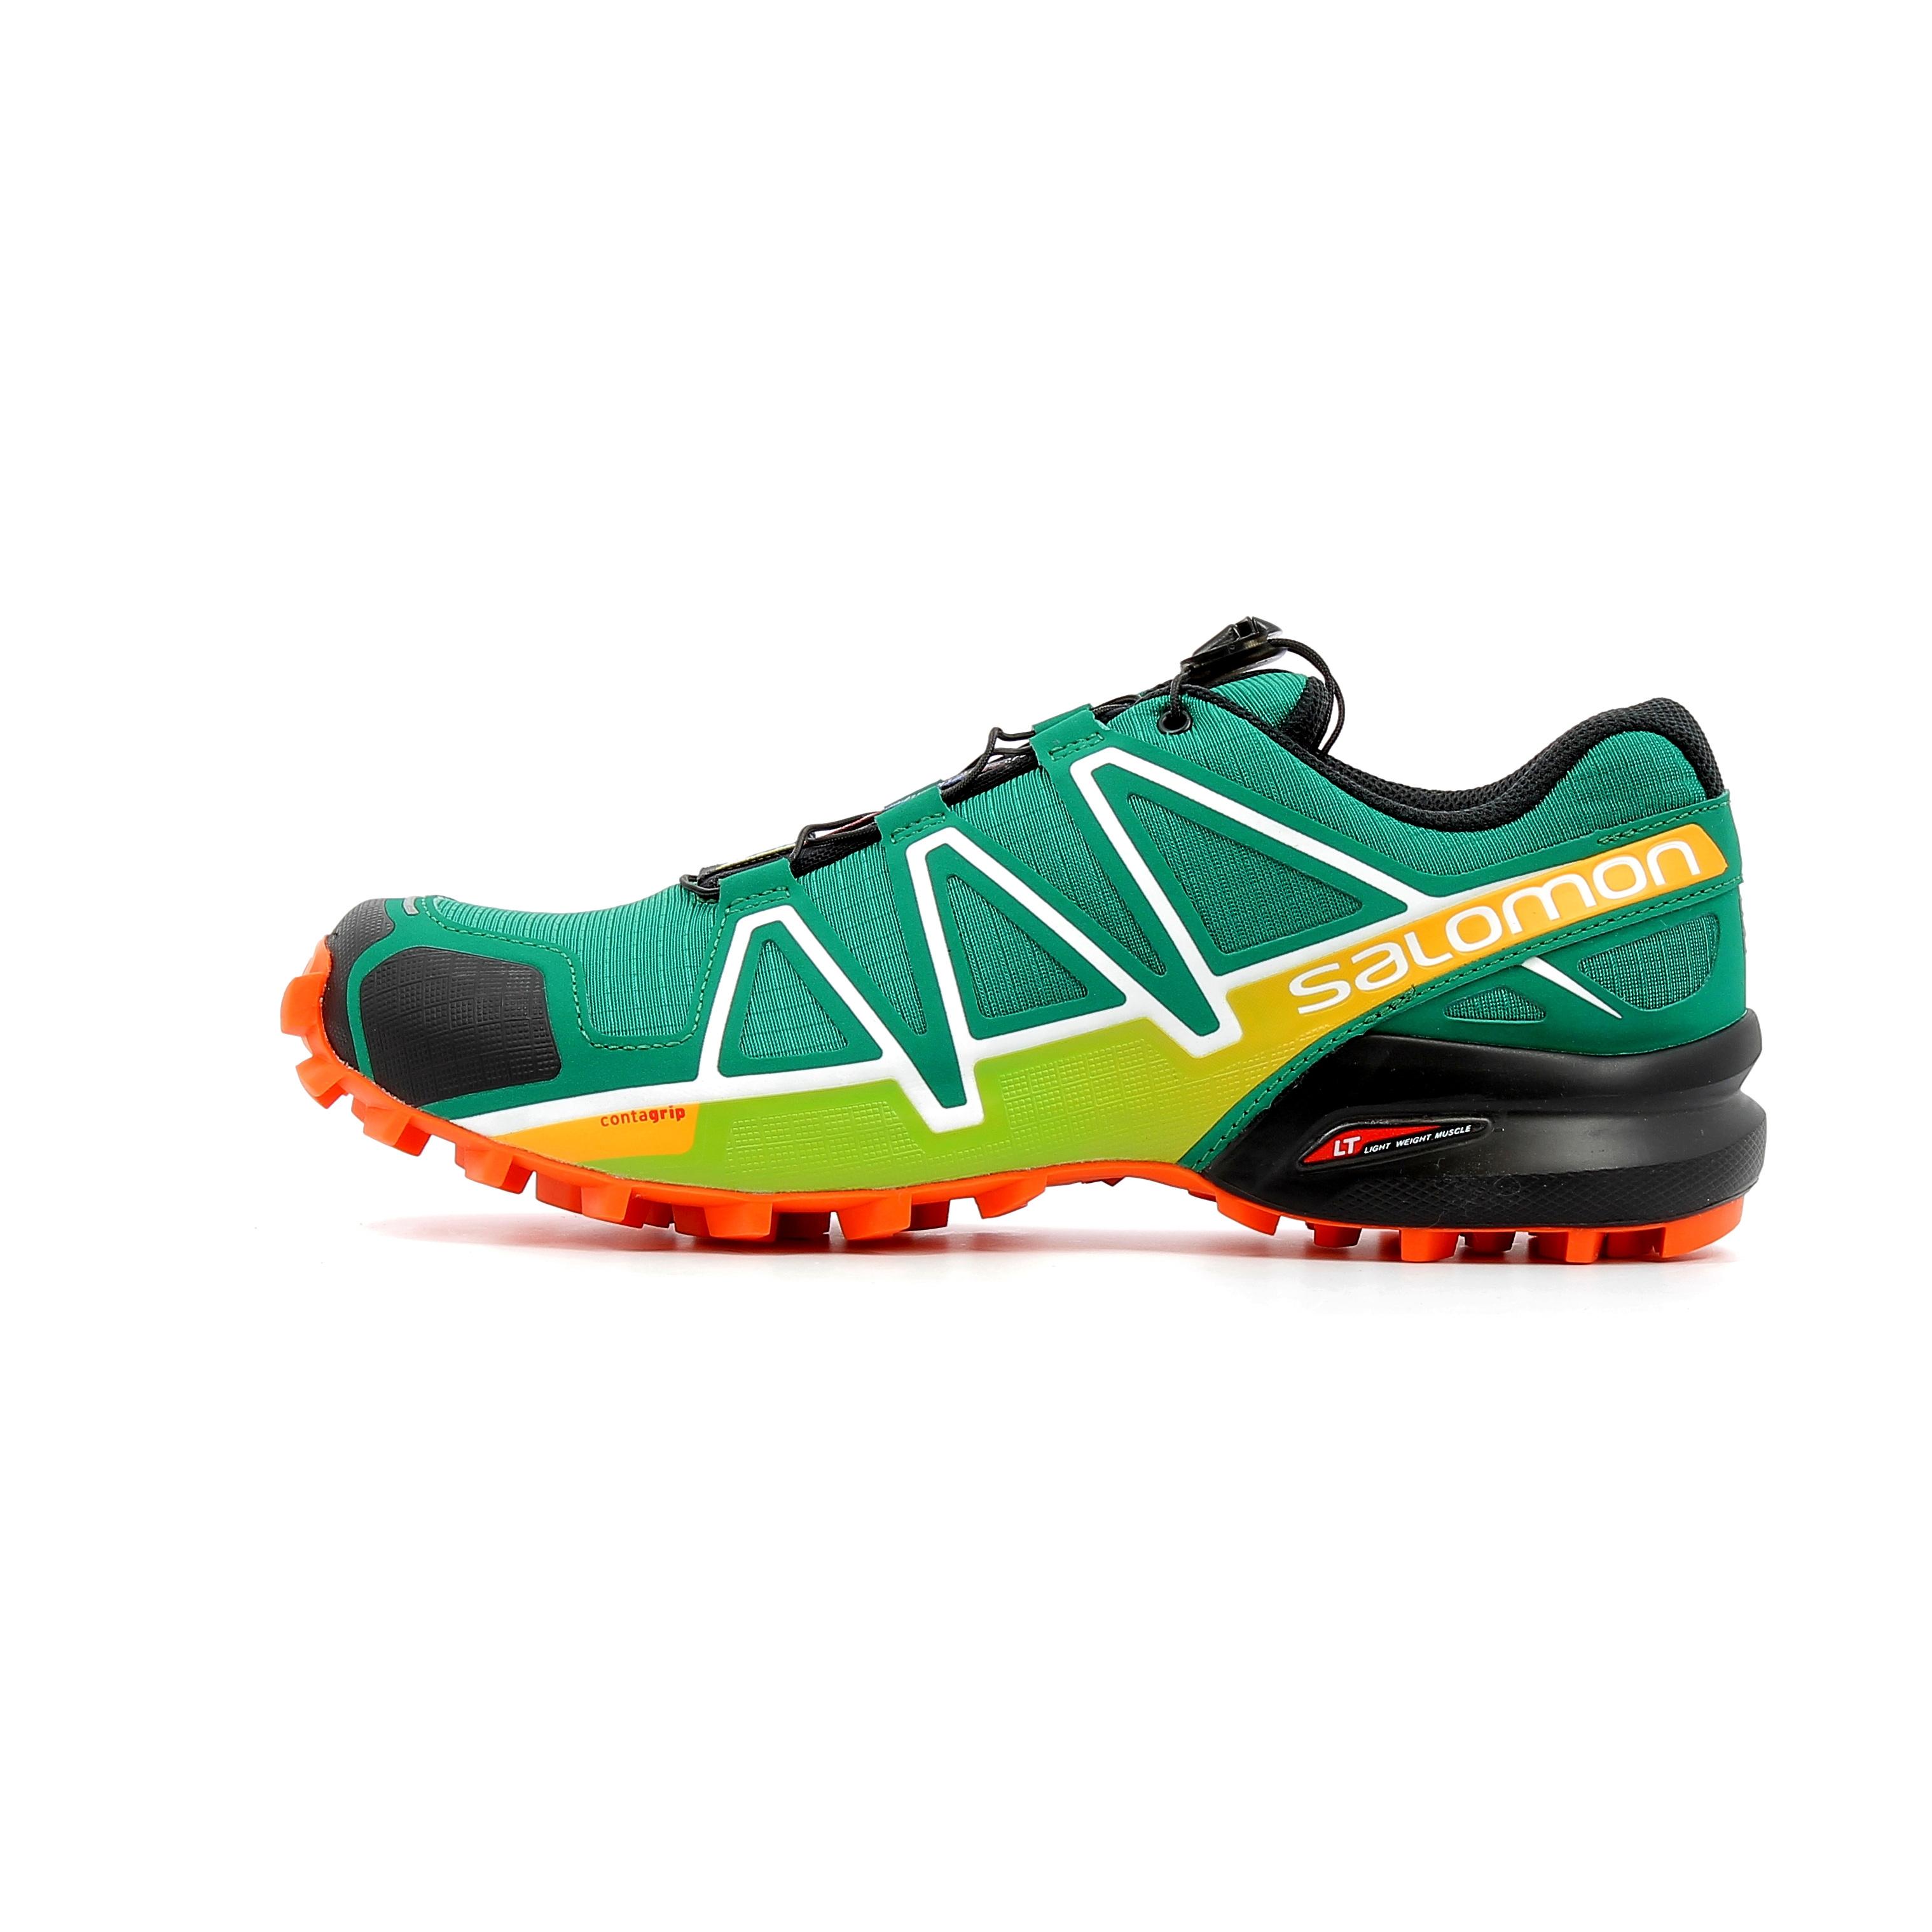 Trail De Salomon Speedcross M 4 Chaussure NZPkn0O8wX